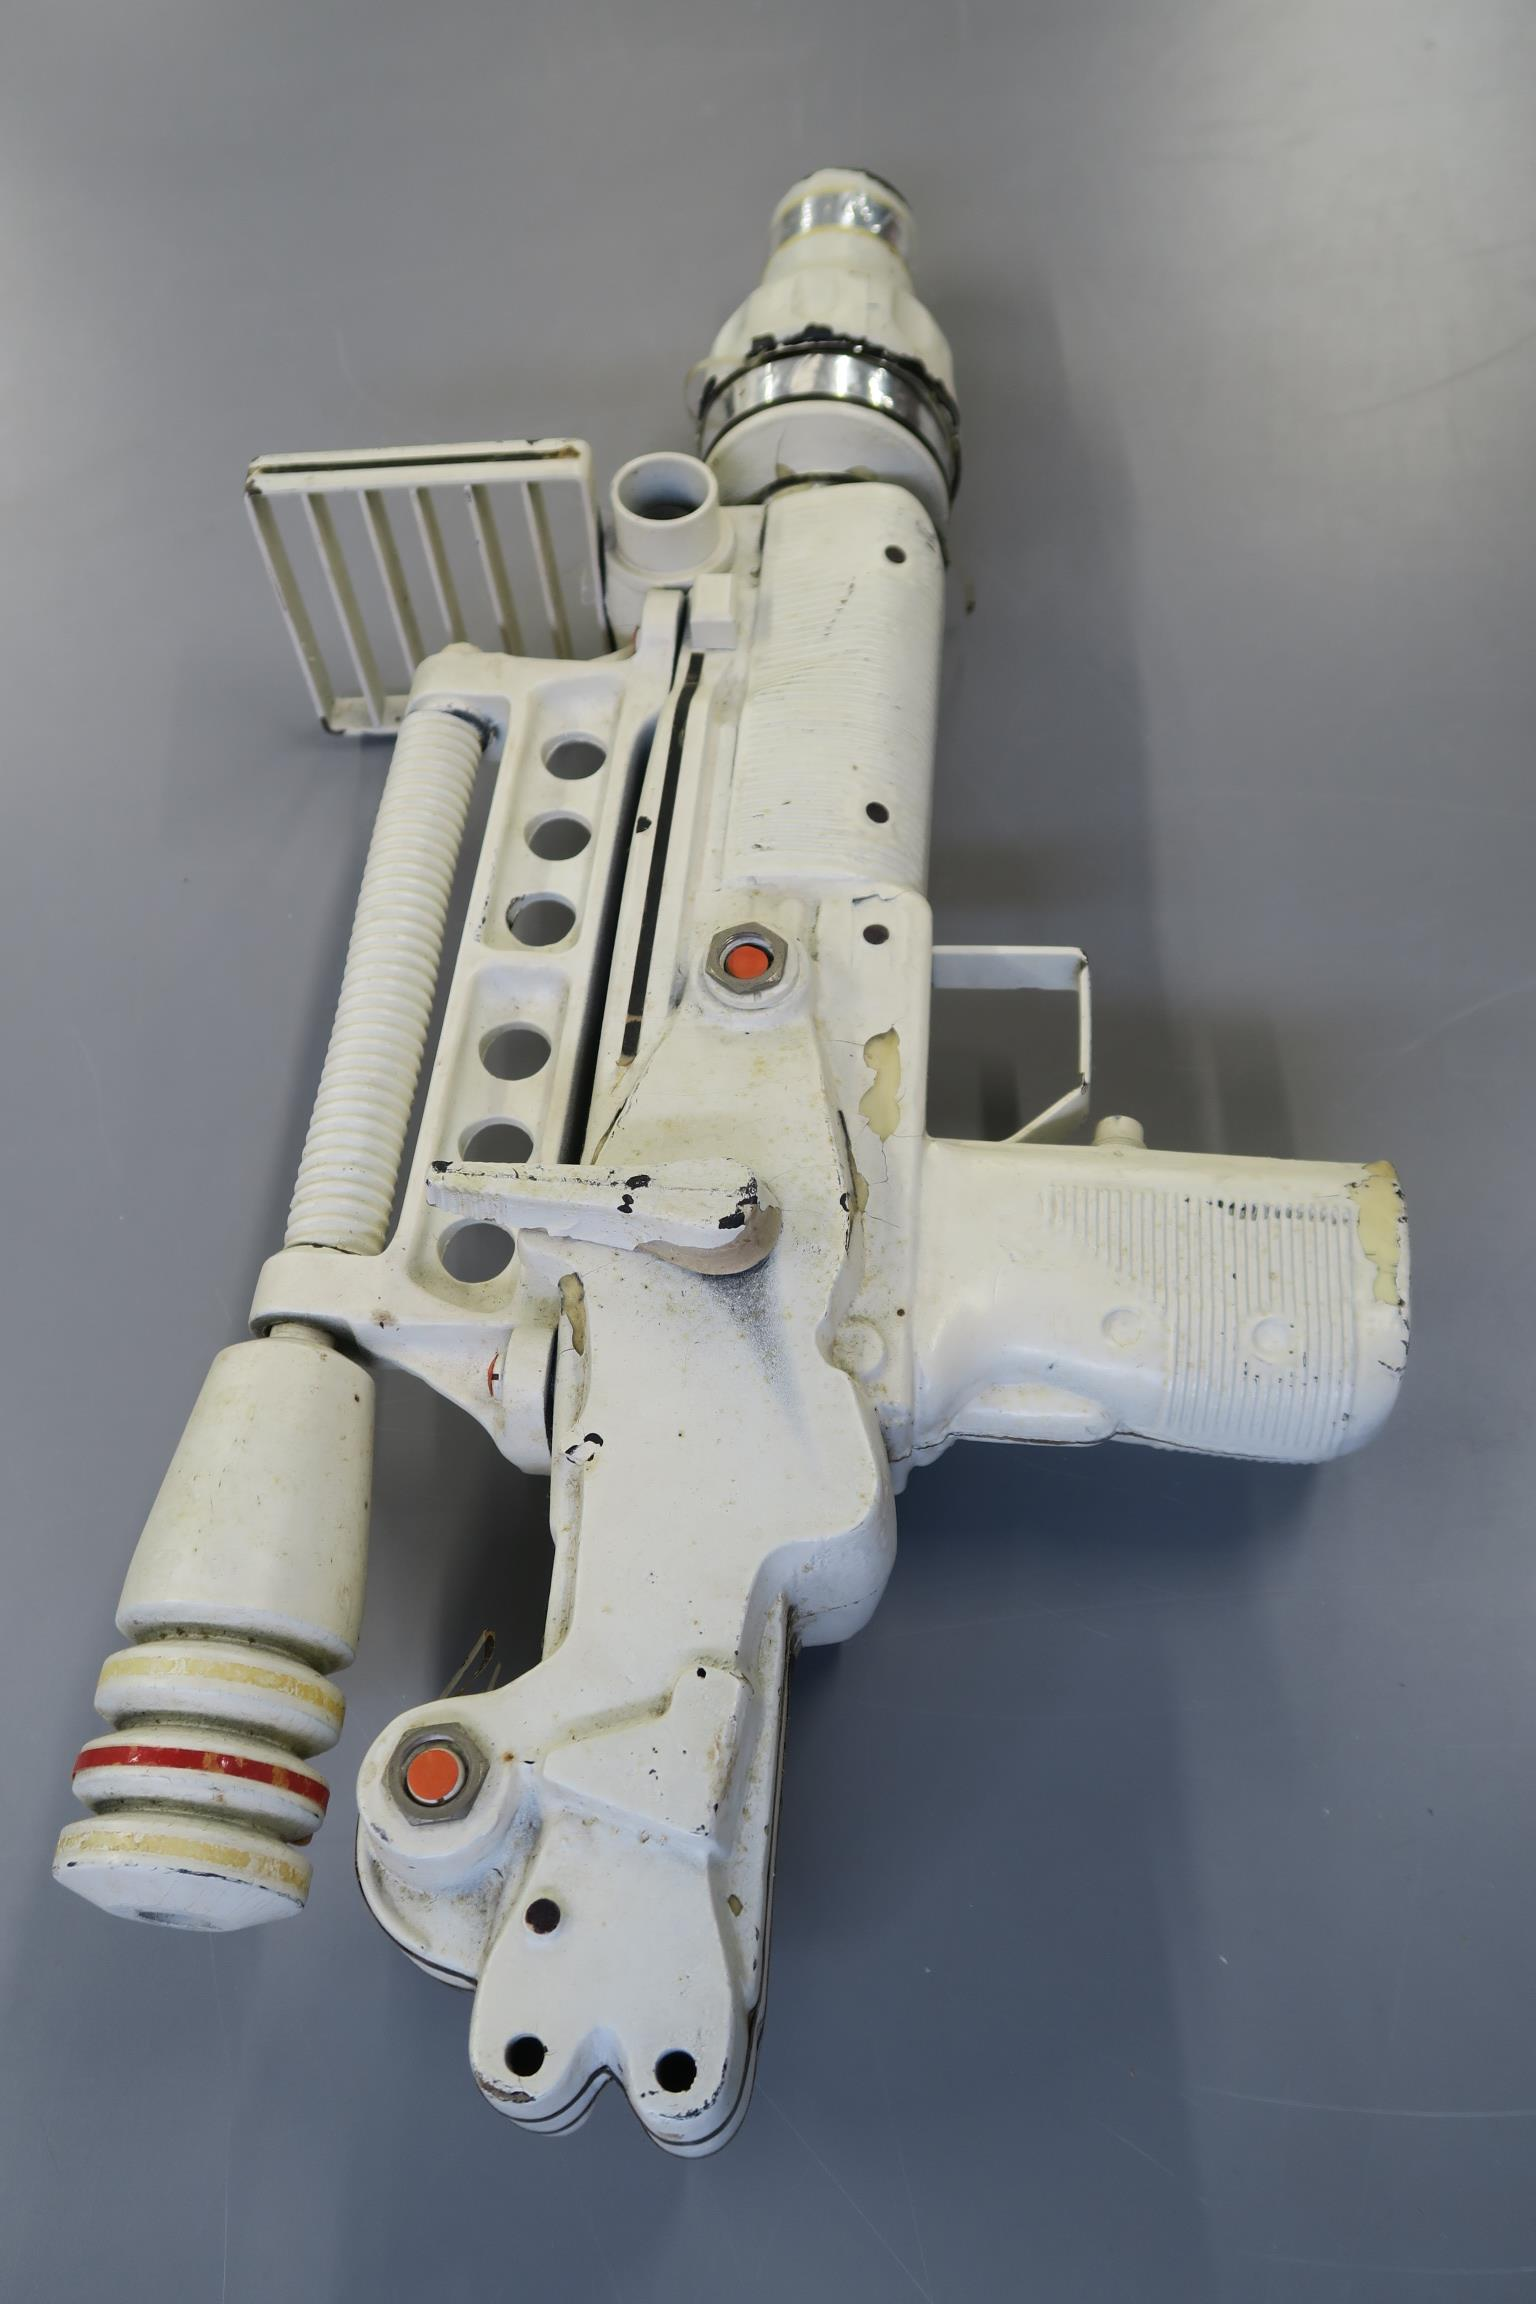 JAMES BOND 007 : Moonraker laser rifle created especially for this futuristic James Bond 1979 film. - Image 3 of 7